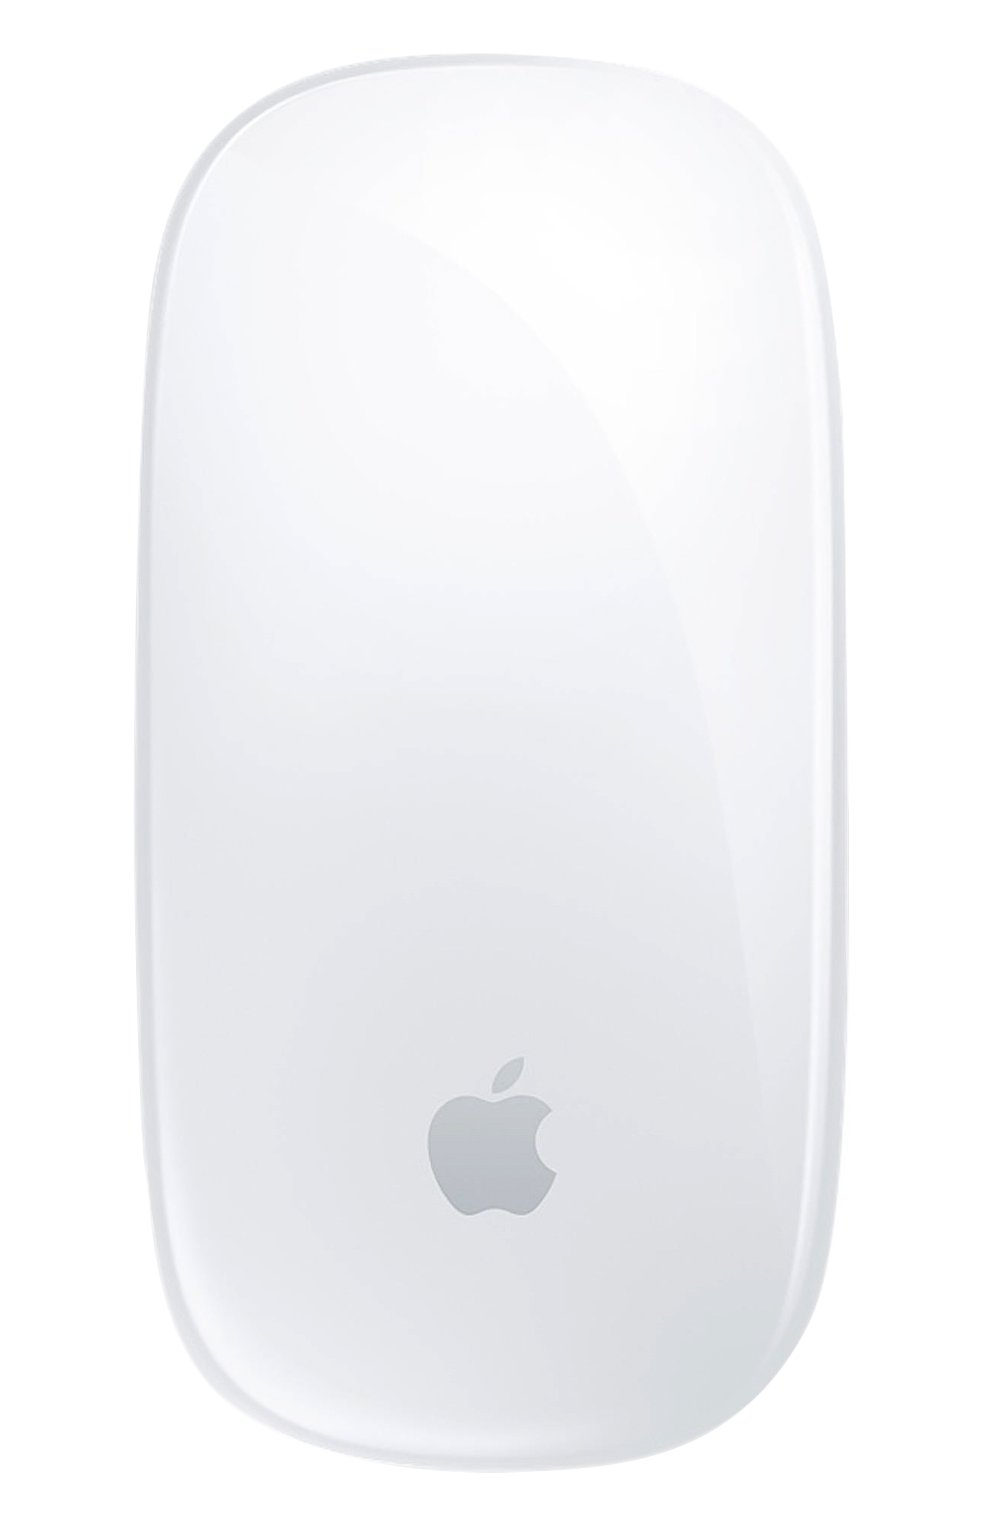 Мышь Apple Magic Mouse 2 | Фото №1